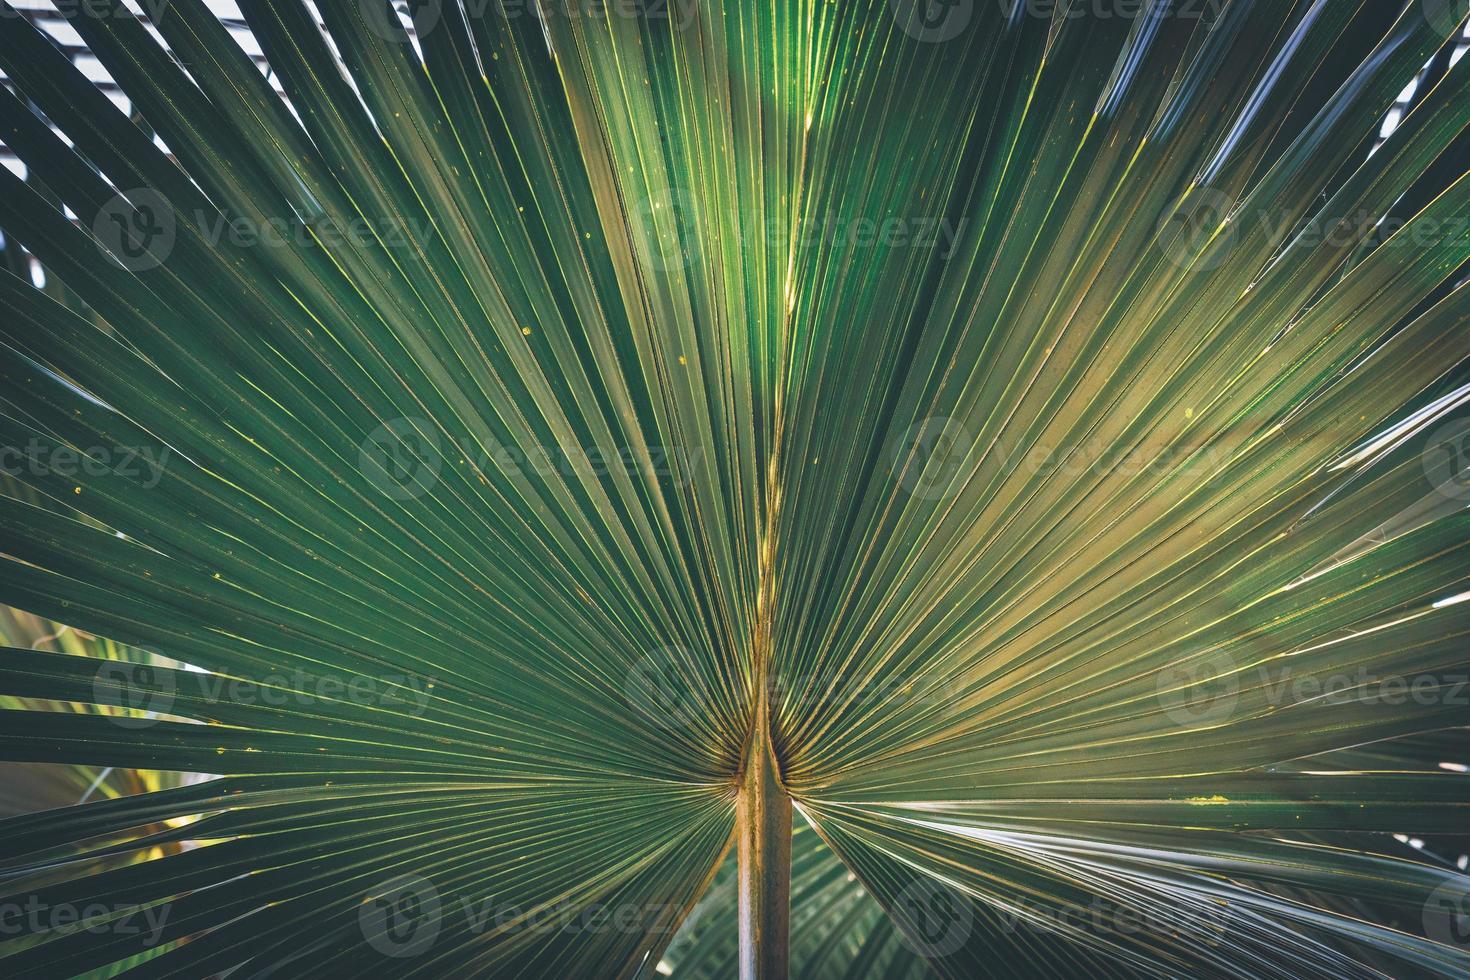 palm fan palm california foto